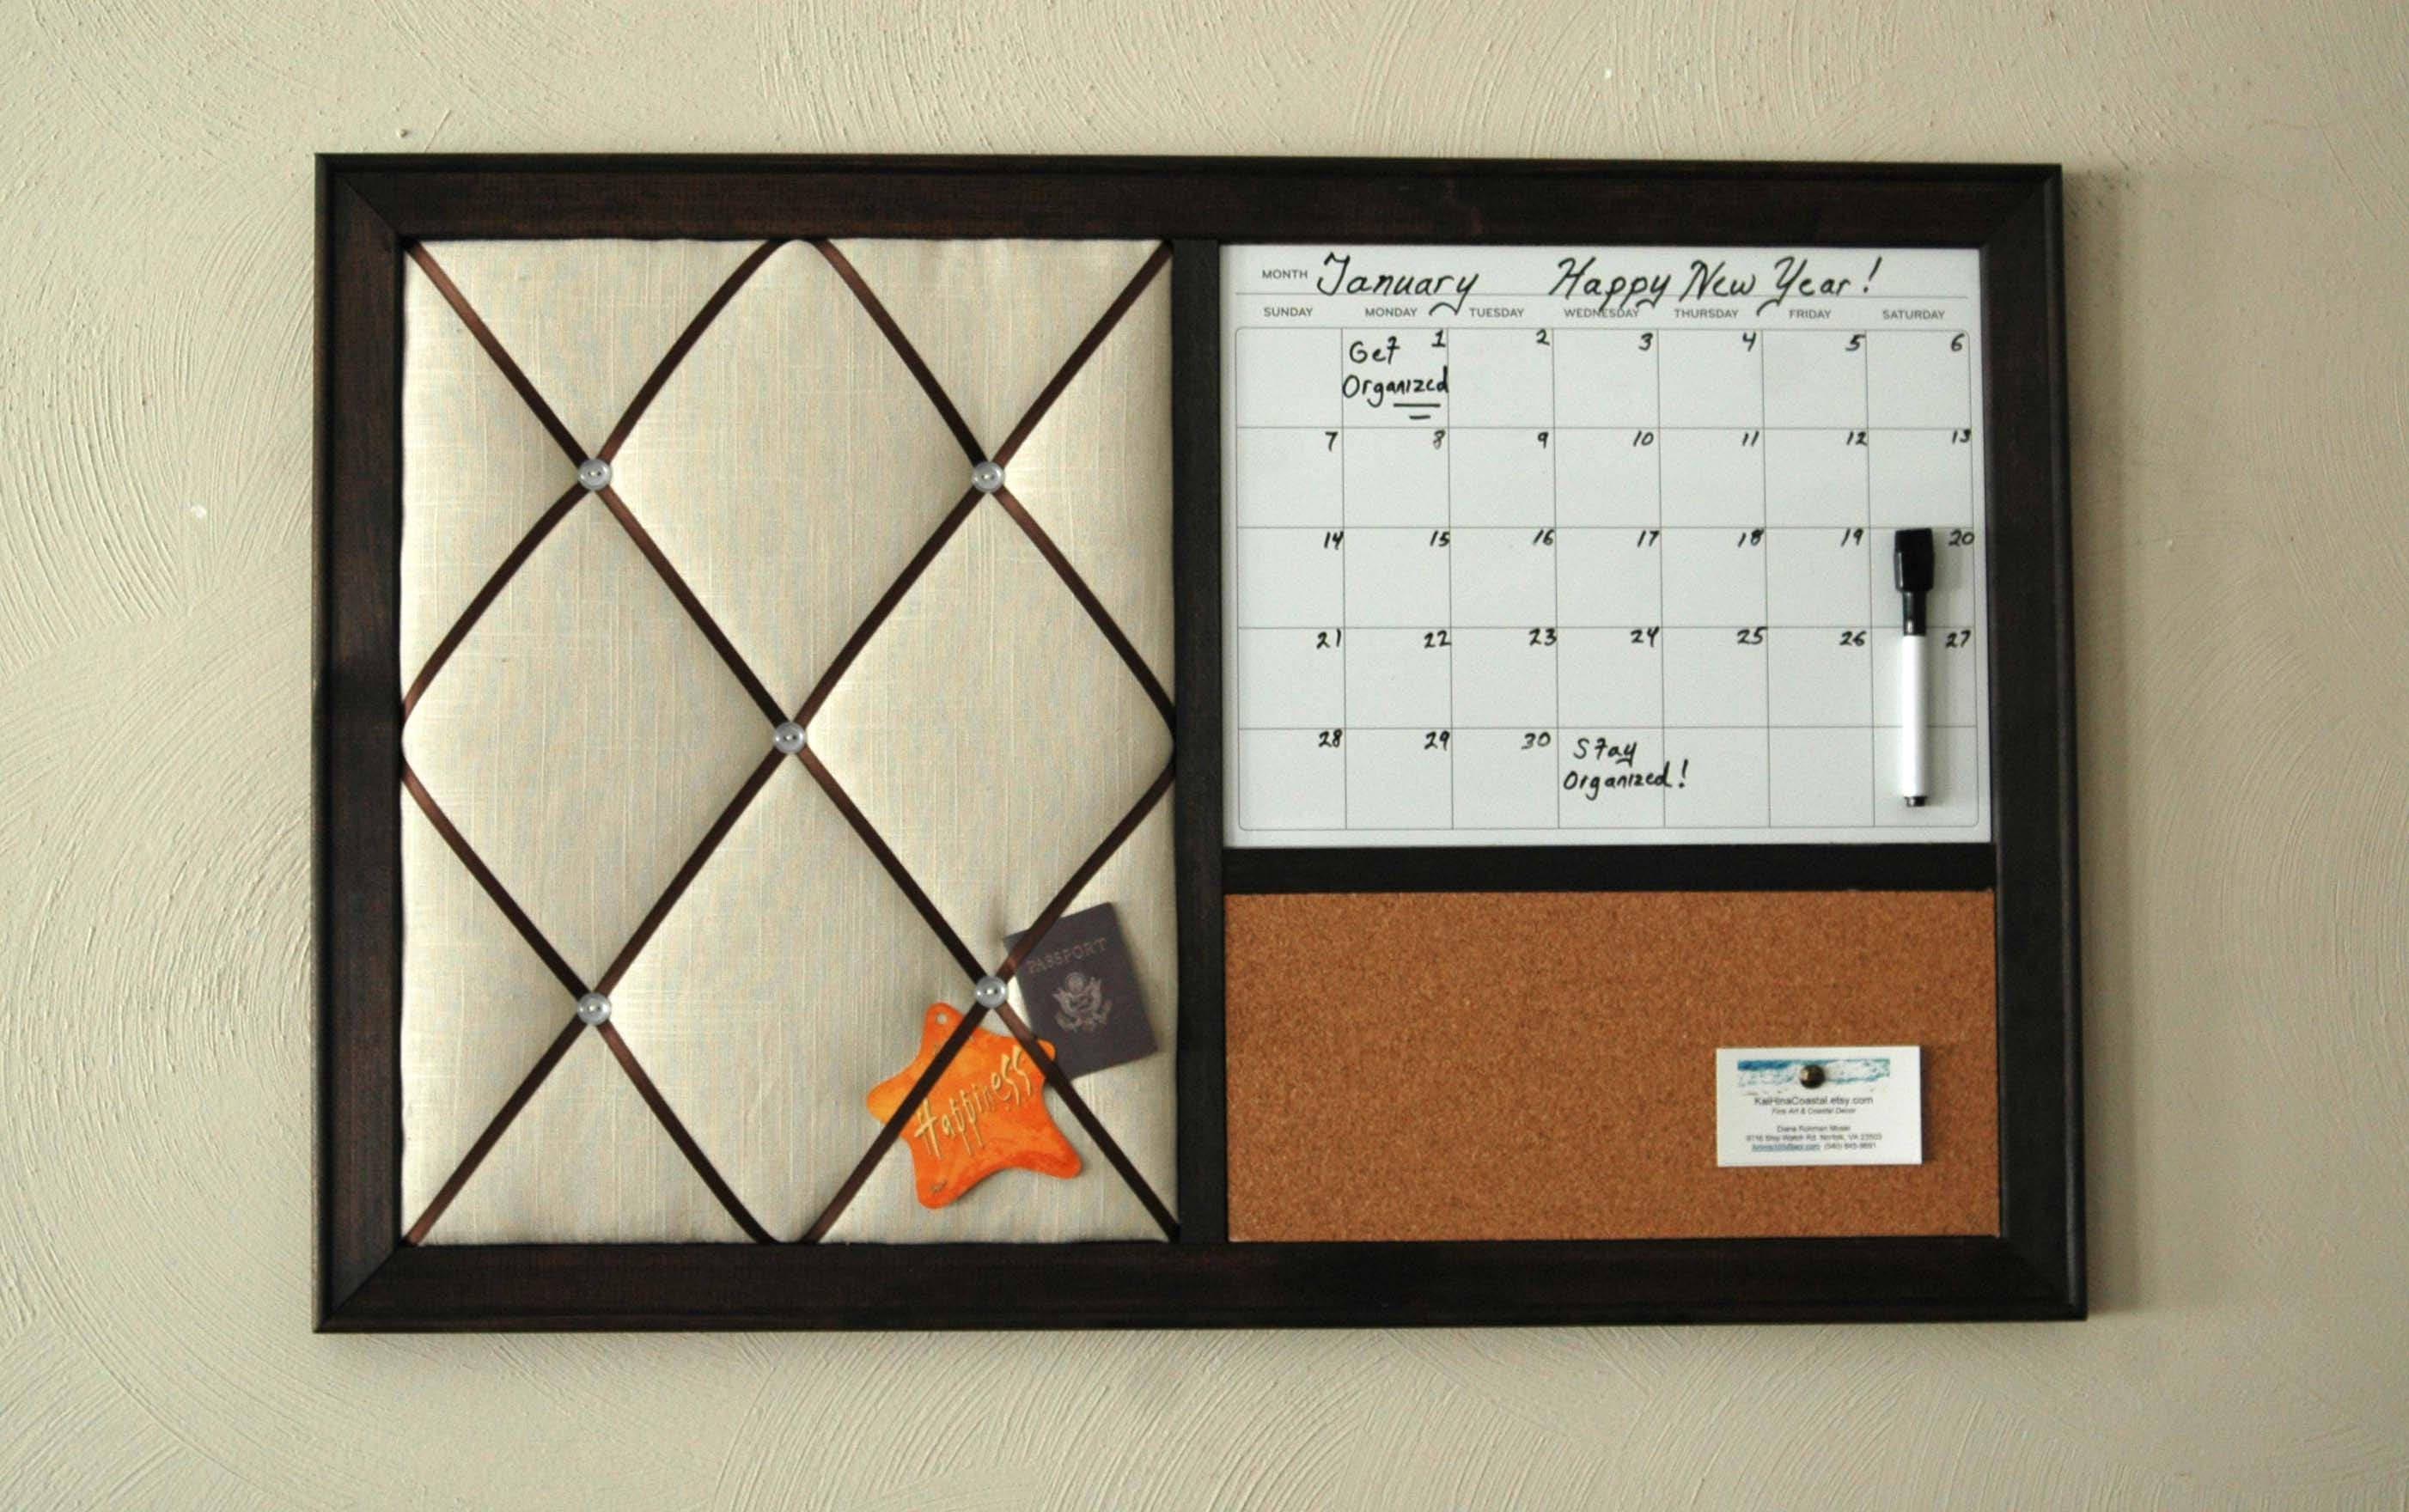 Trocken löschen Kalender Pinnwand Französisch Memoboard